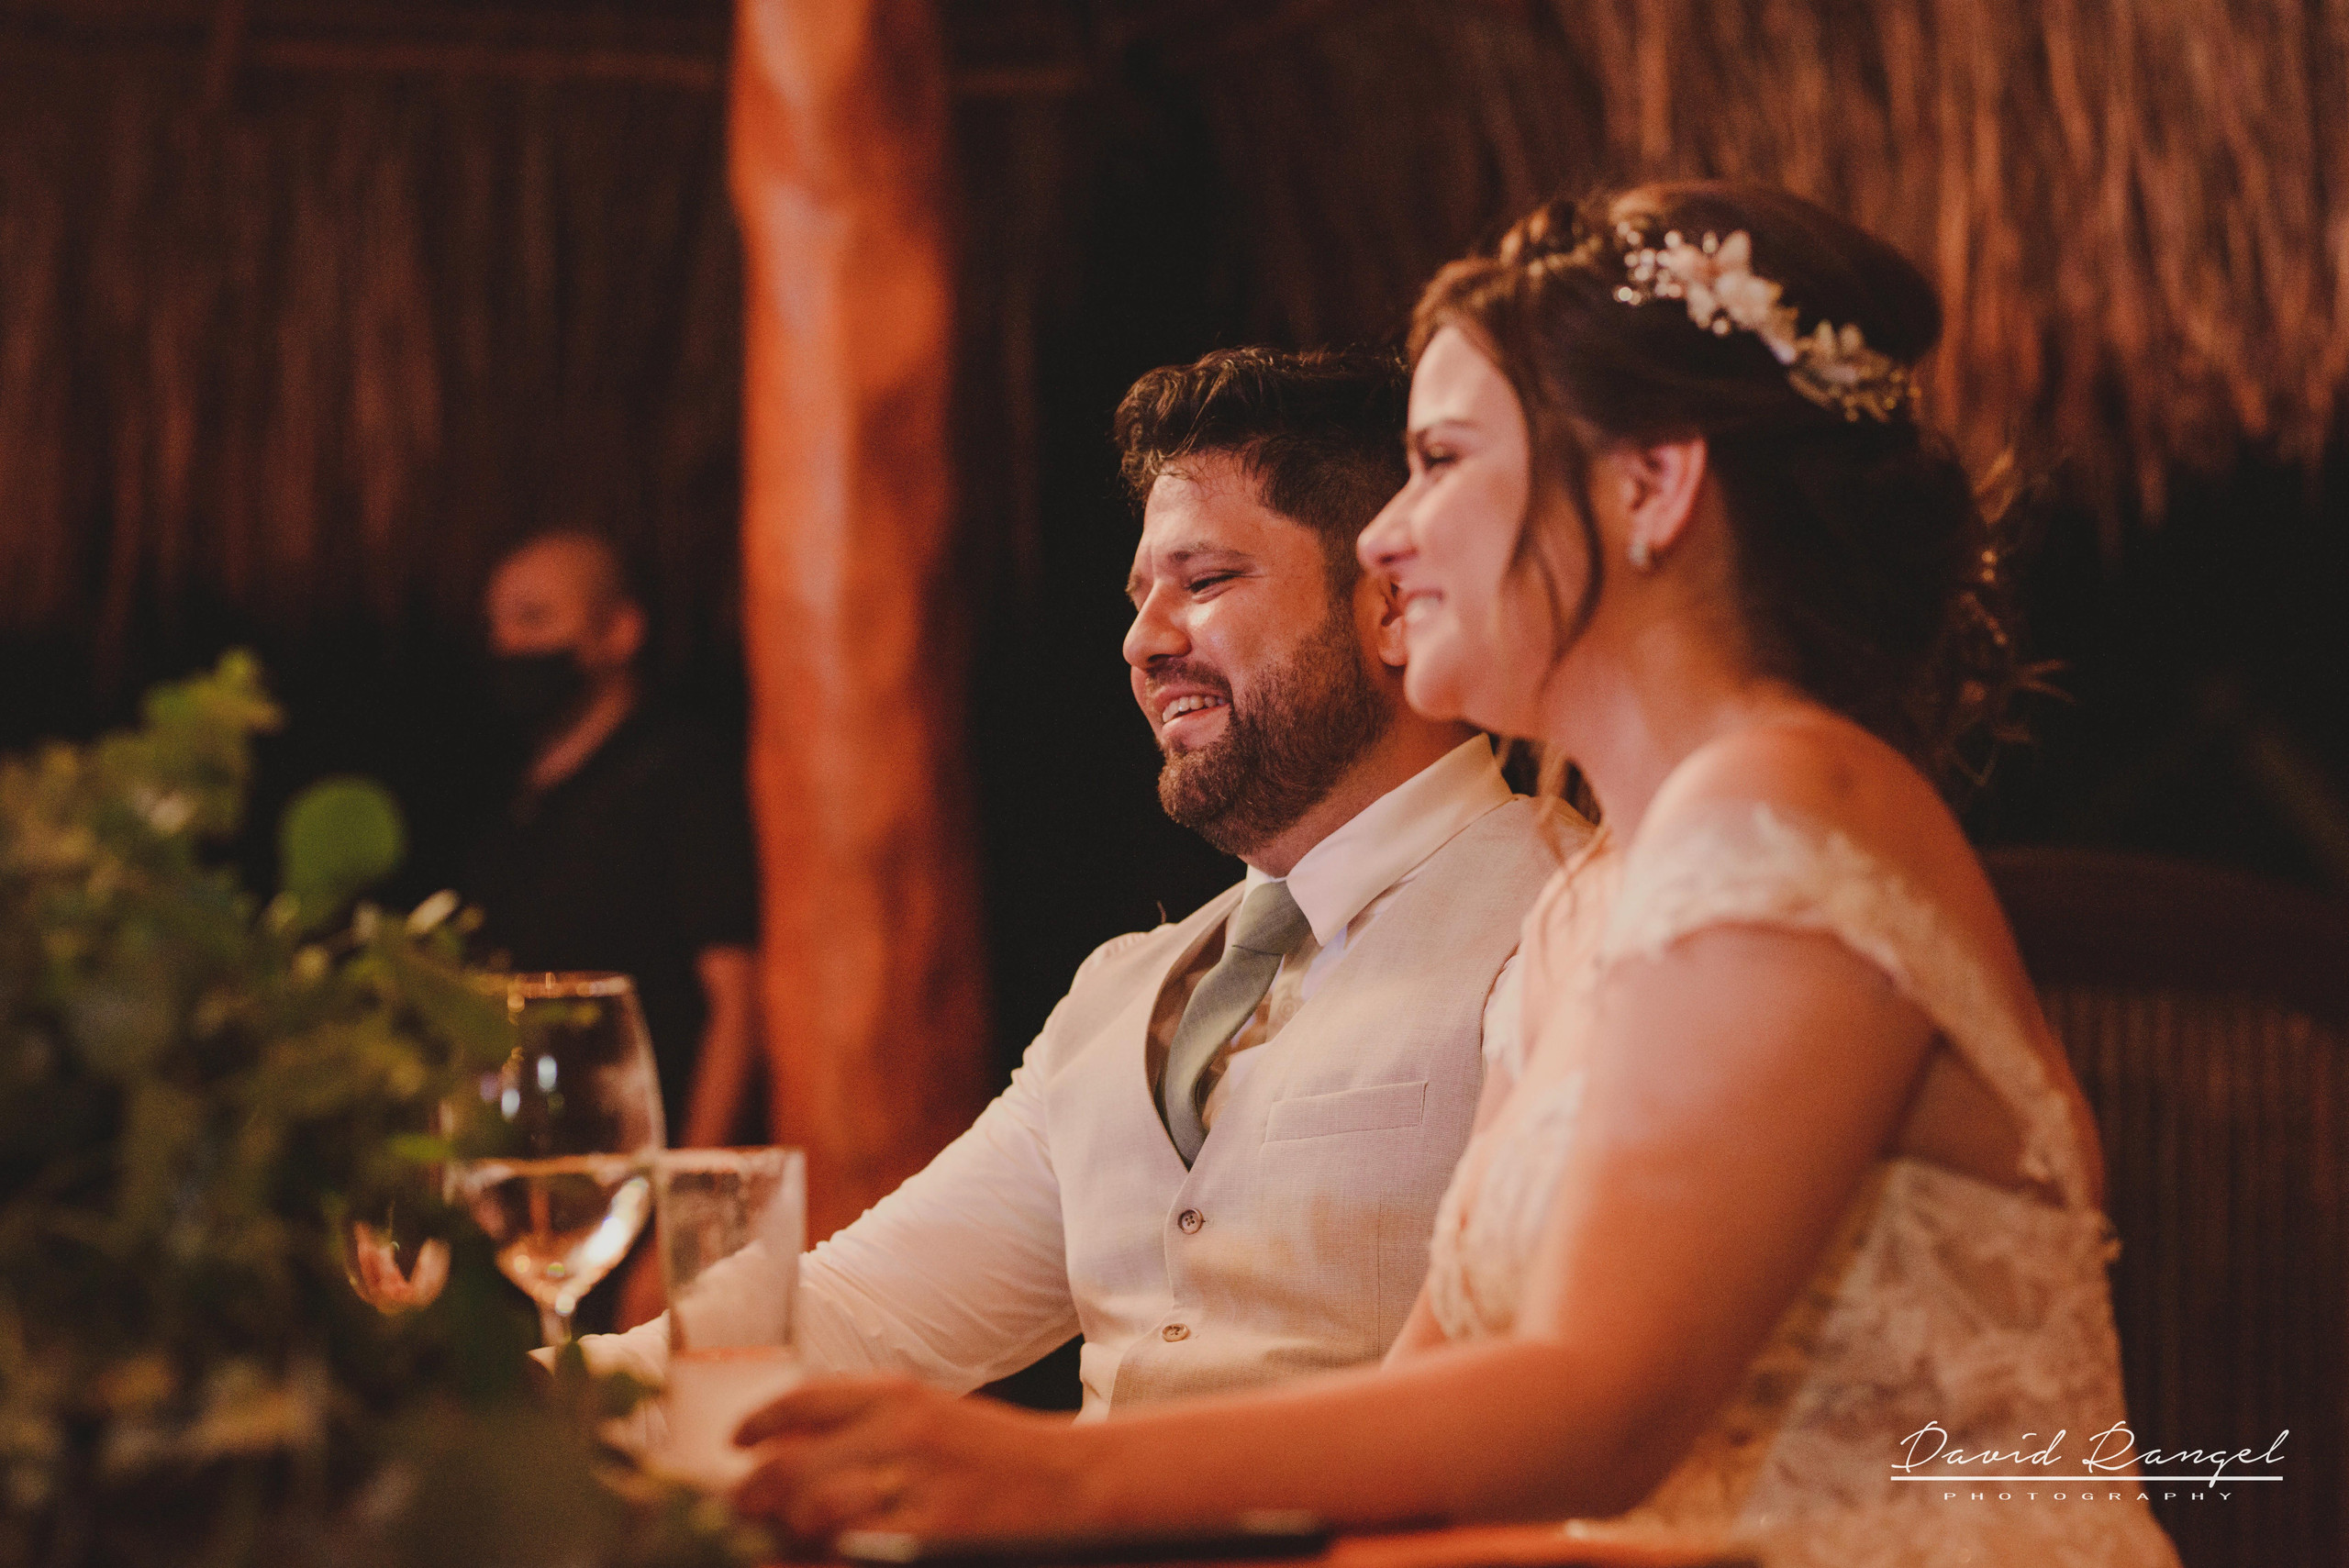 bride+groom+beach+session+happy+love+couple+celebration+wedding+photo+beach+caribean+sea+photographer+david+rangel+dress+suit+villa+chenera+reception+father+speaches